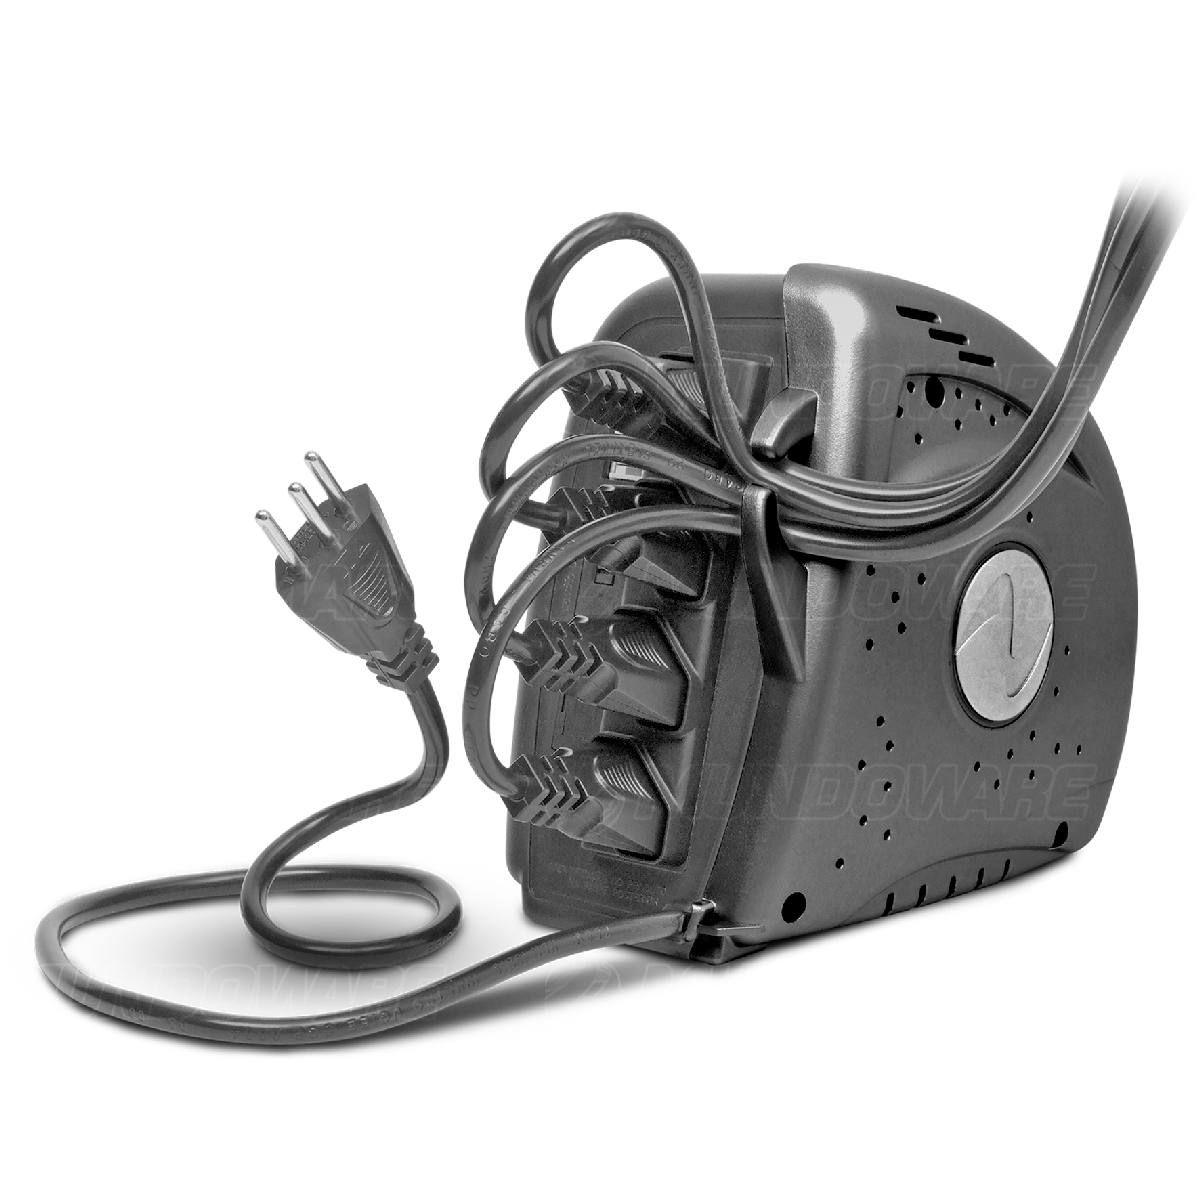 Estabilizador 300VA 300W Trivolt 4 Tomadas Proteção contra Sobrecarga Curto Circuito Sobretemperatura Ragtech